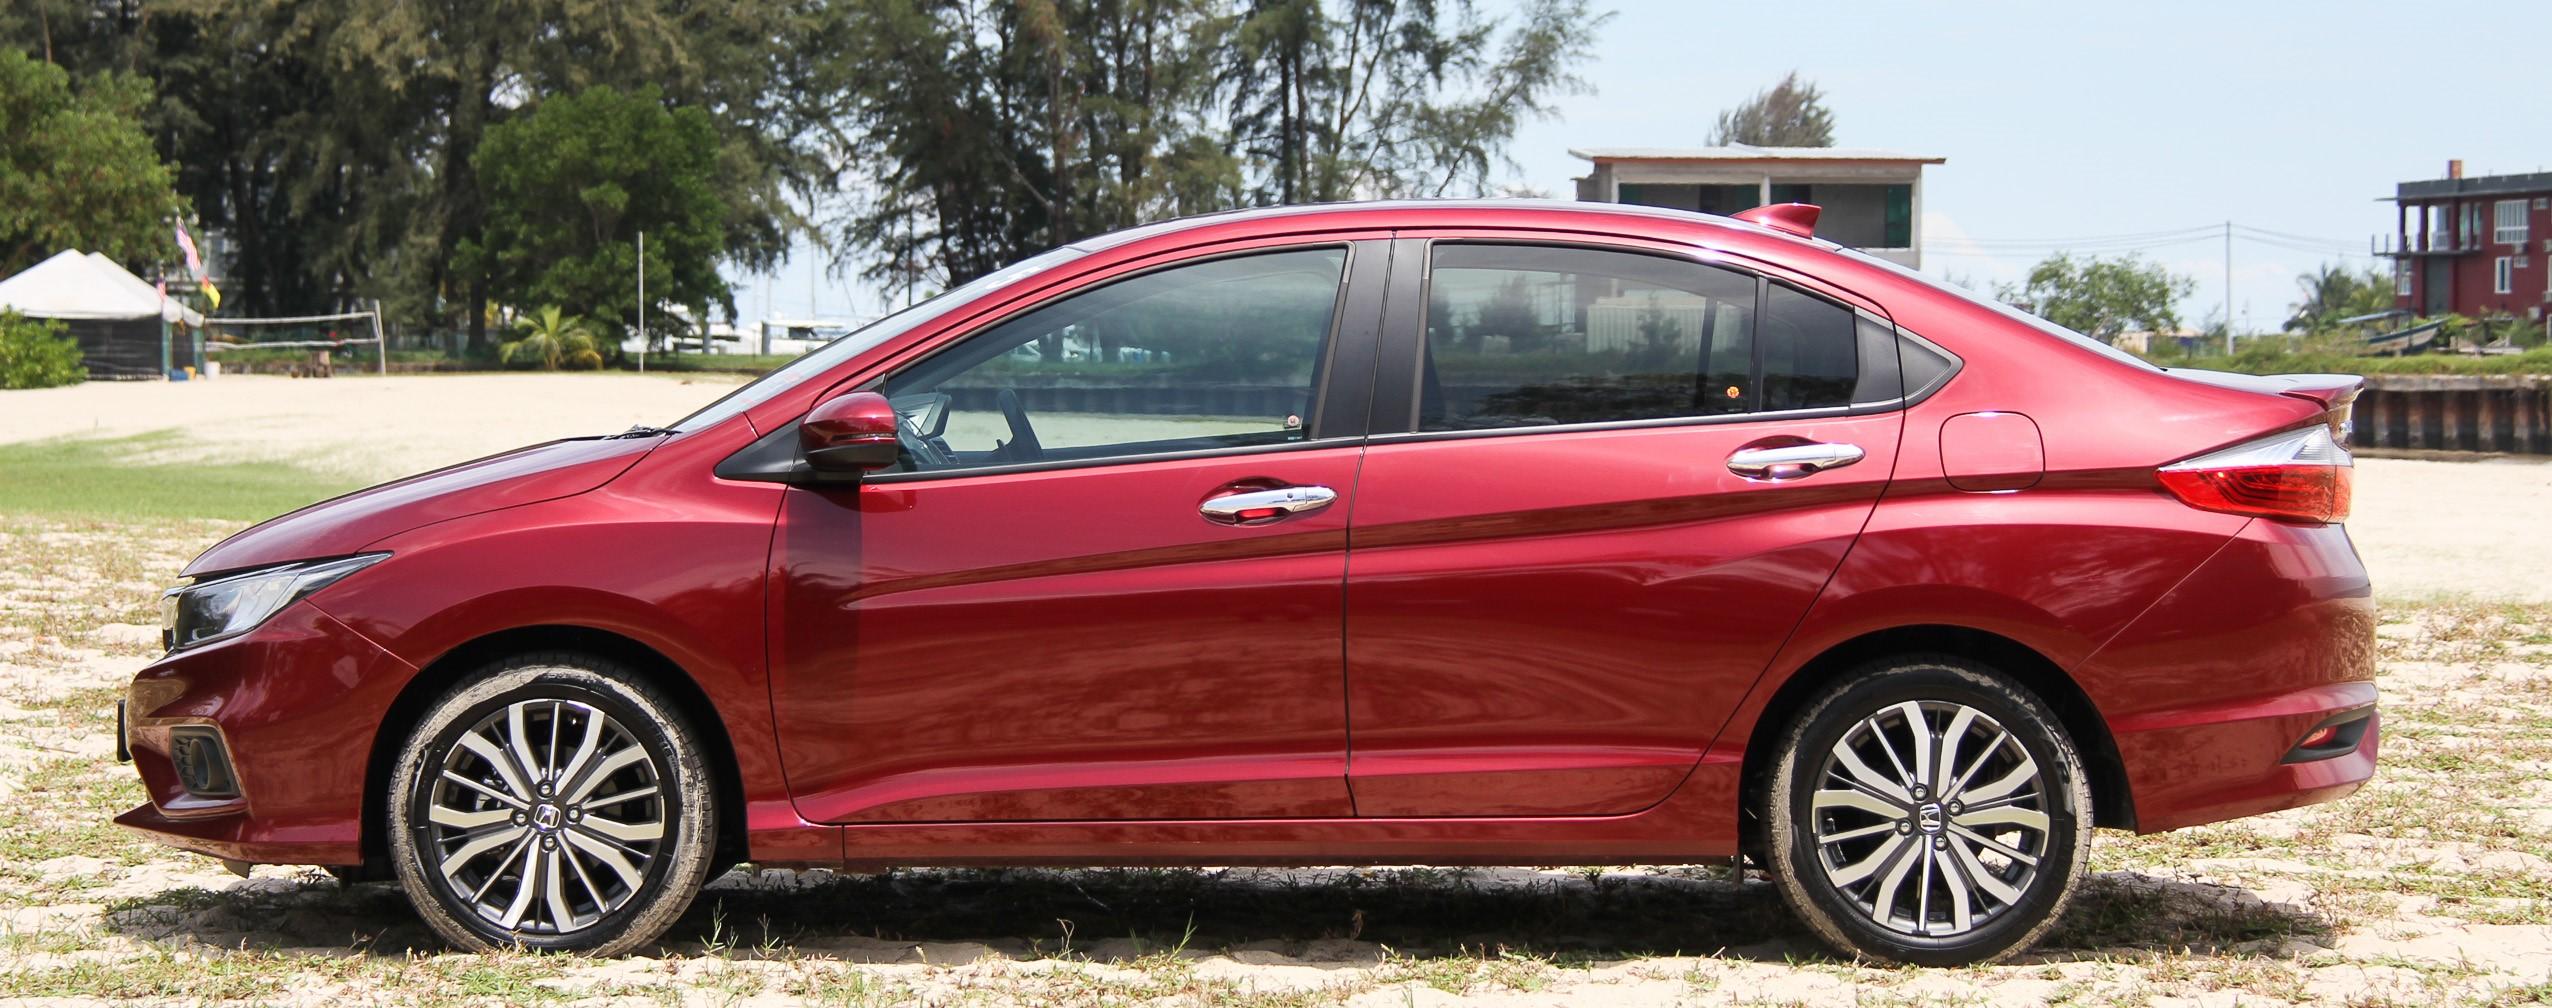 Honda-City-2017-drive-Malacca-3 - PakWheels Blog